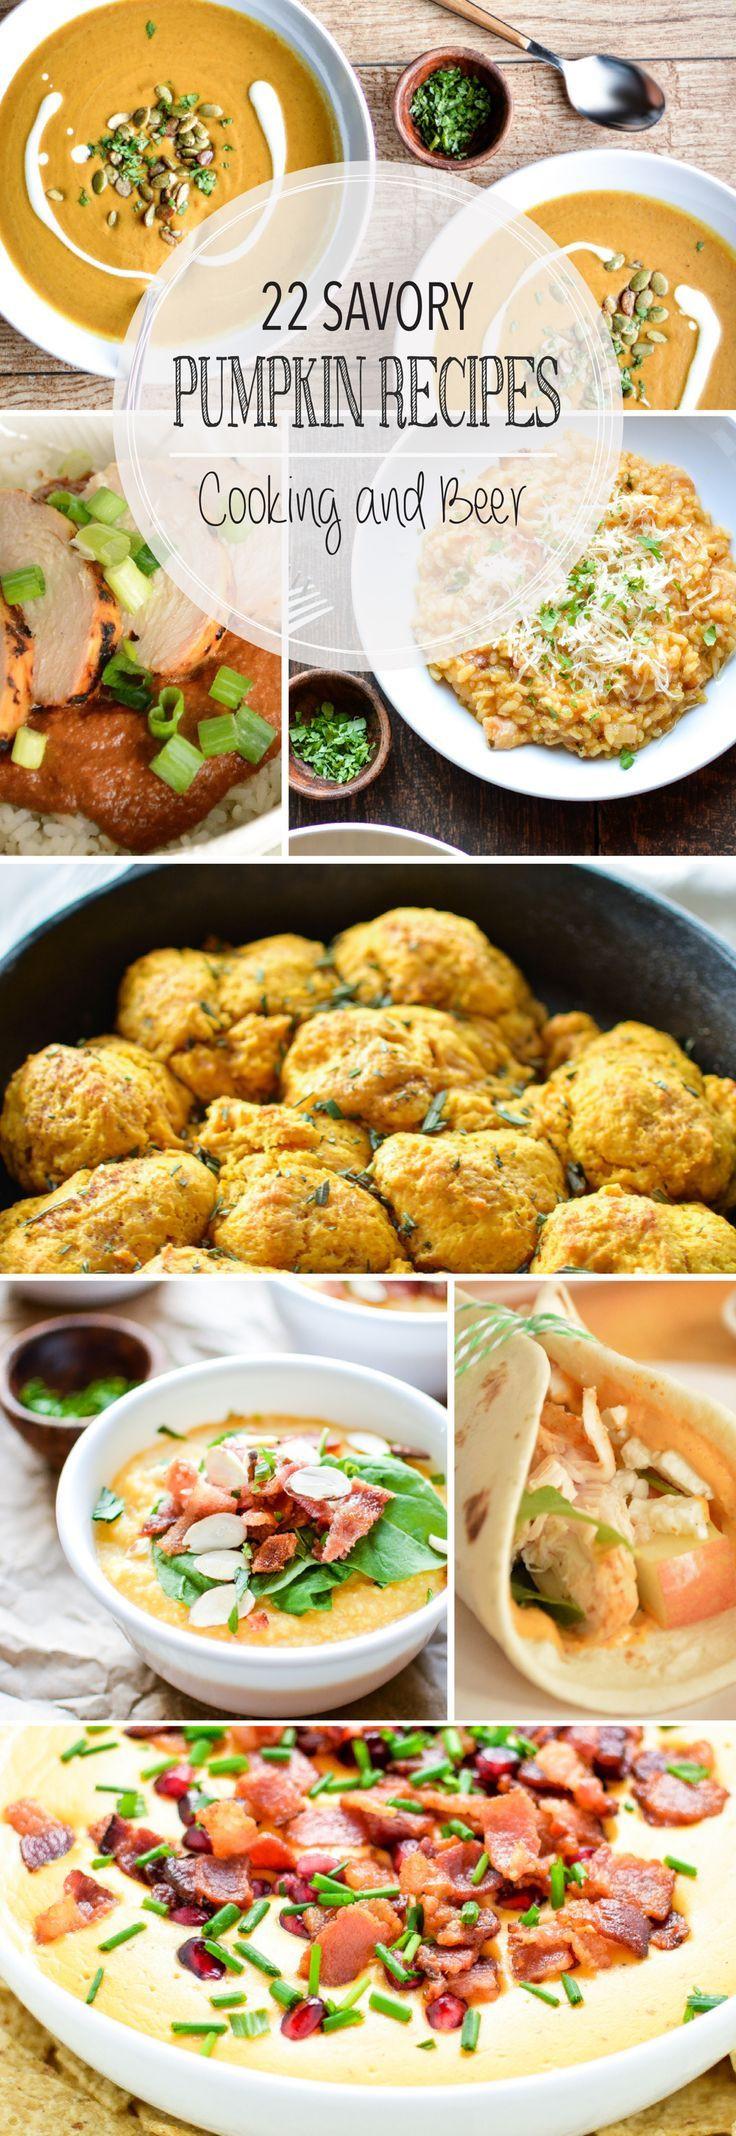 Healthy Pumpkin Recipes Dinner  Best 25 Fall dinner recipes ideas on Pinterest